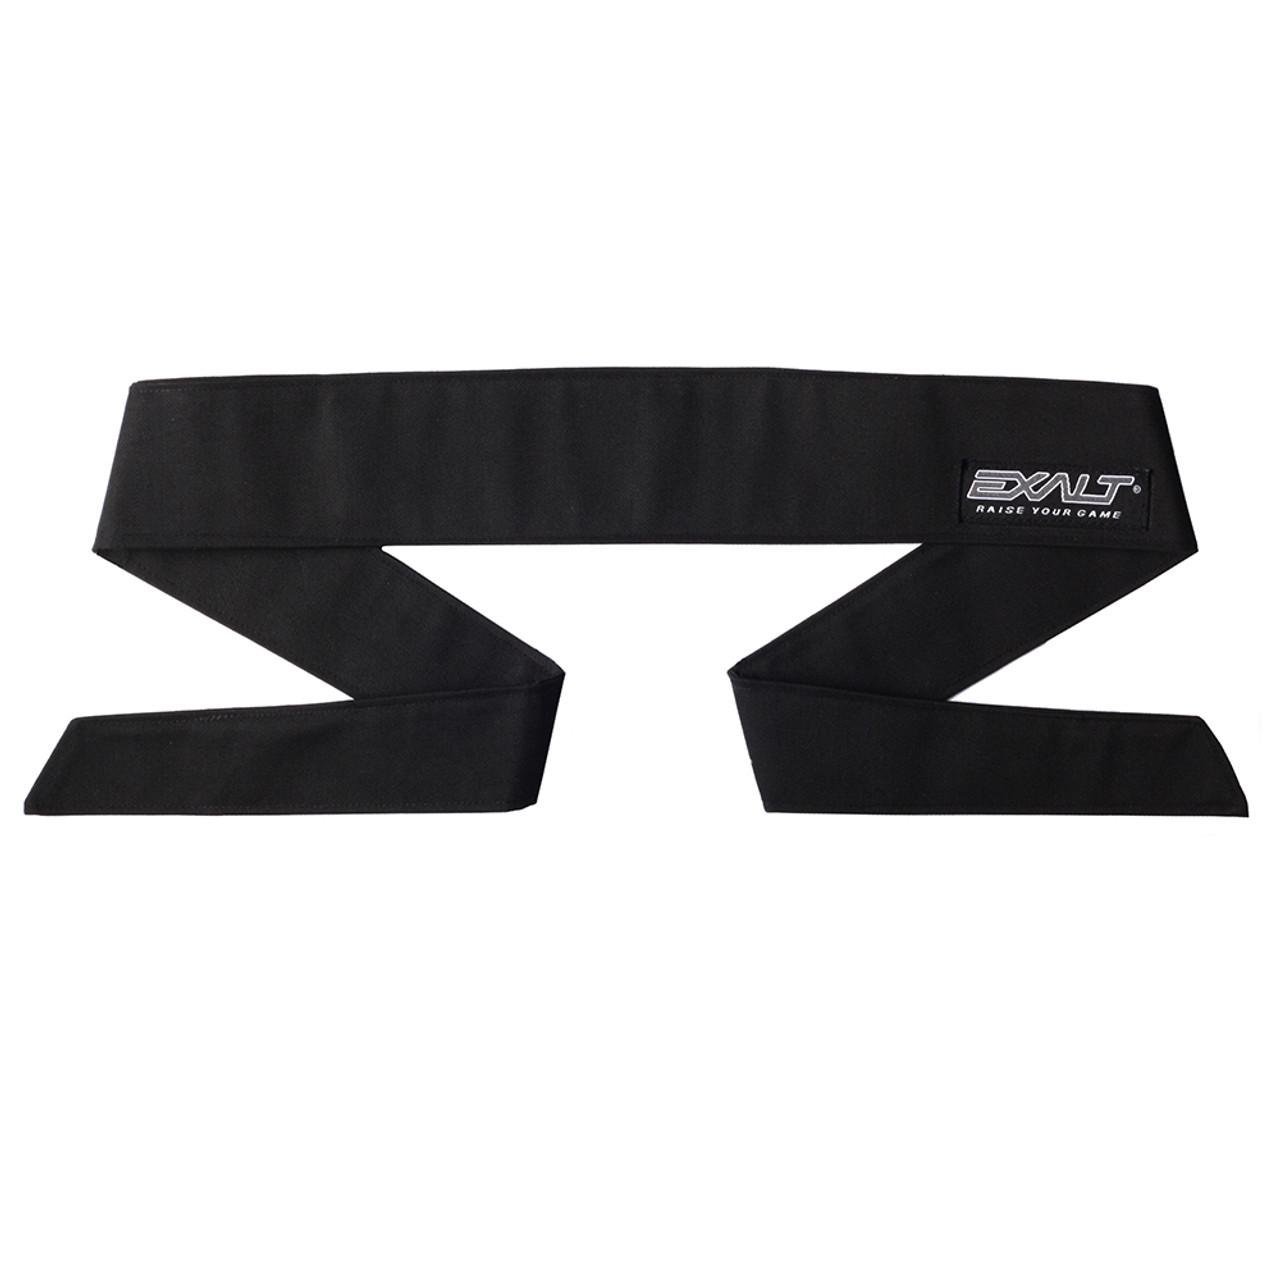 Exalt Headband / Black